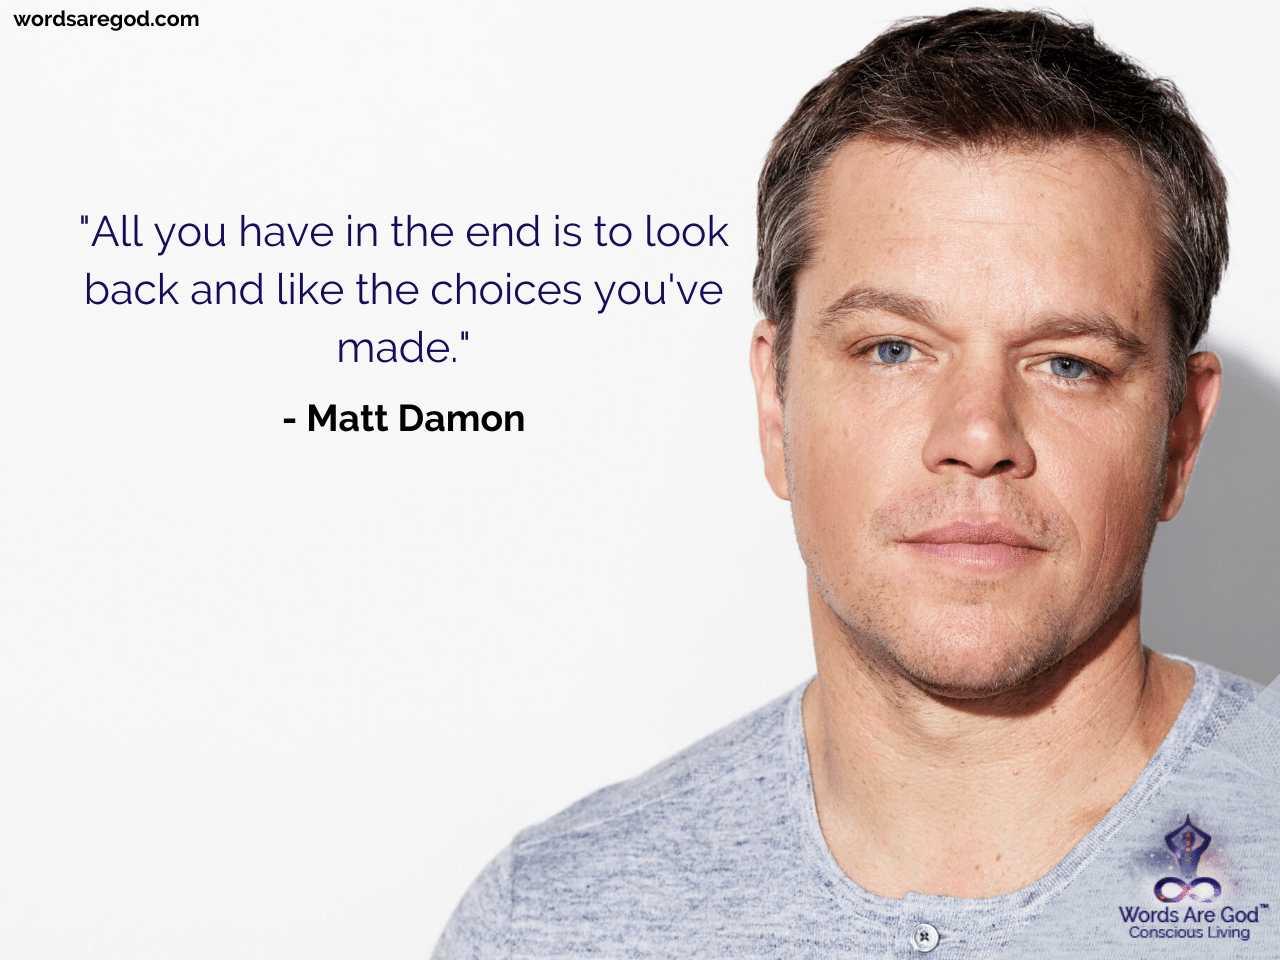 Matt Damon Motivational Quote